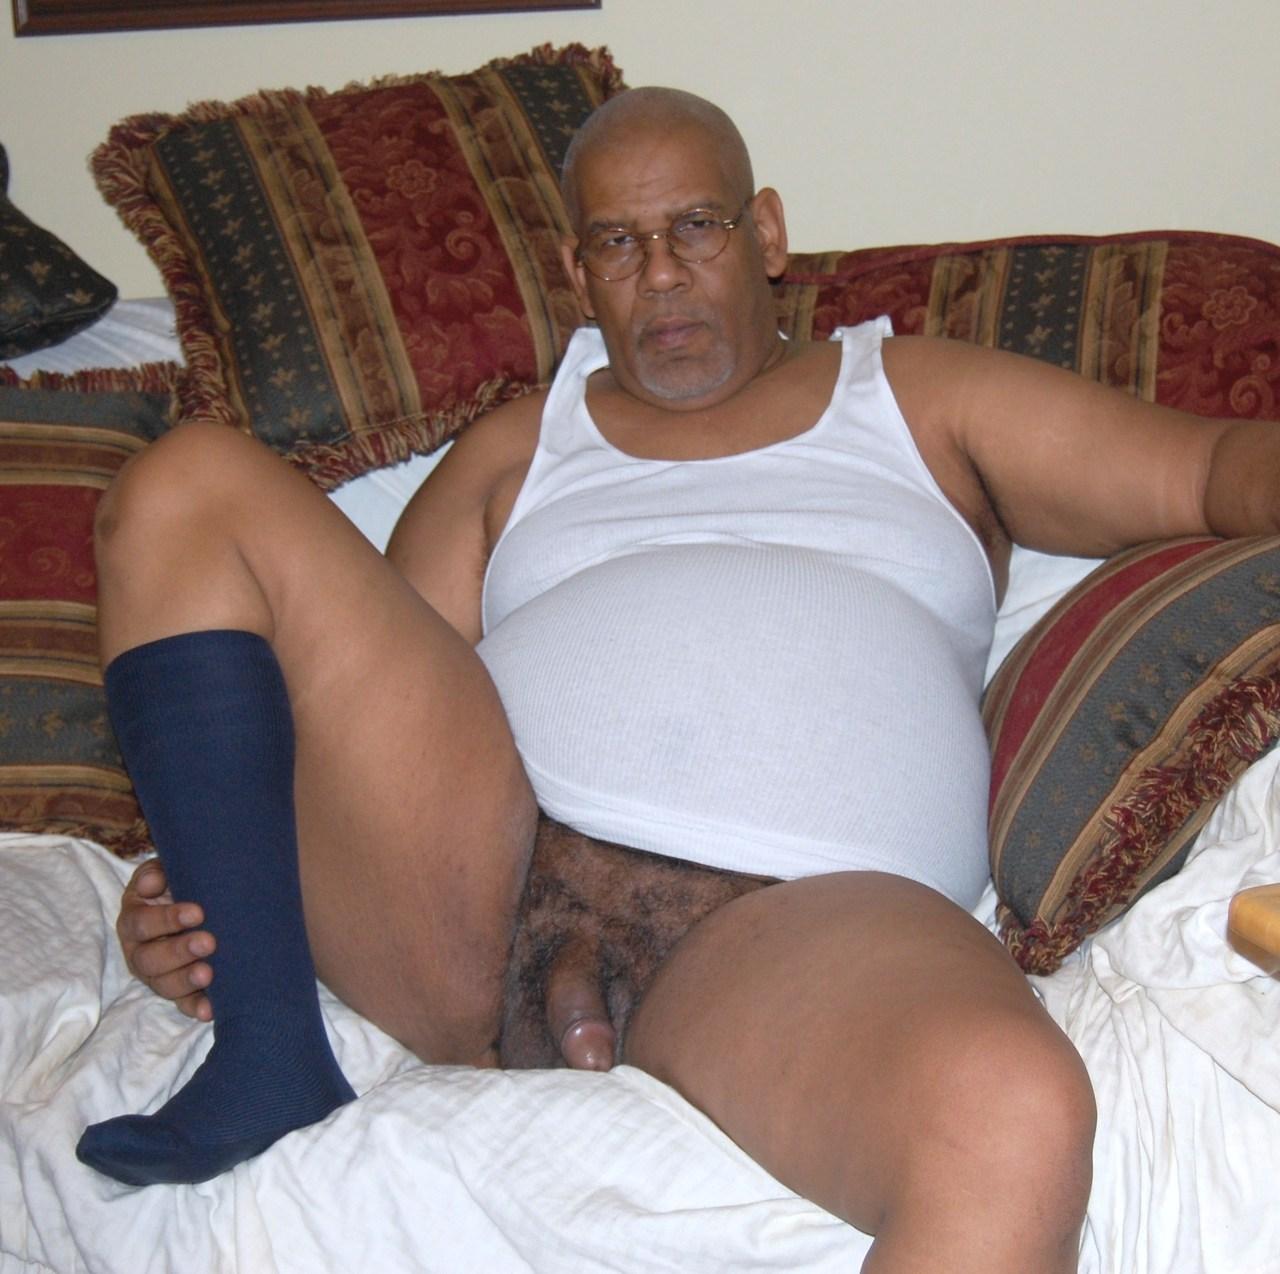 Naked Chubby Men Pics